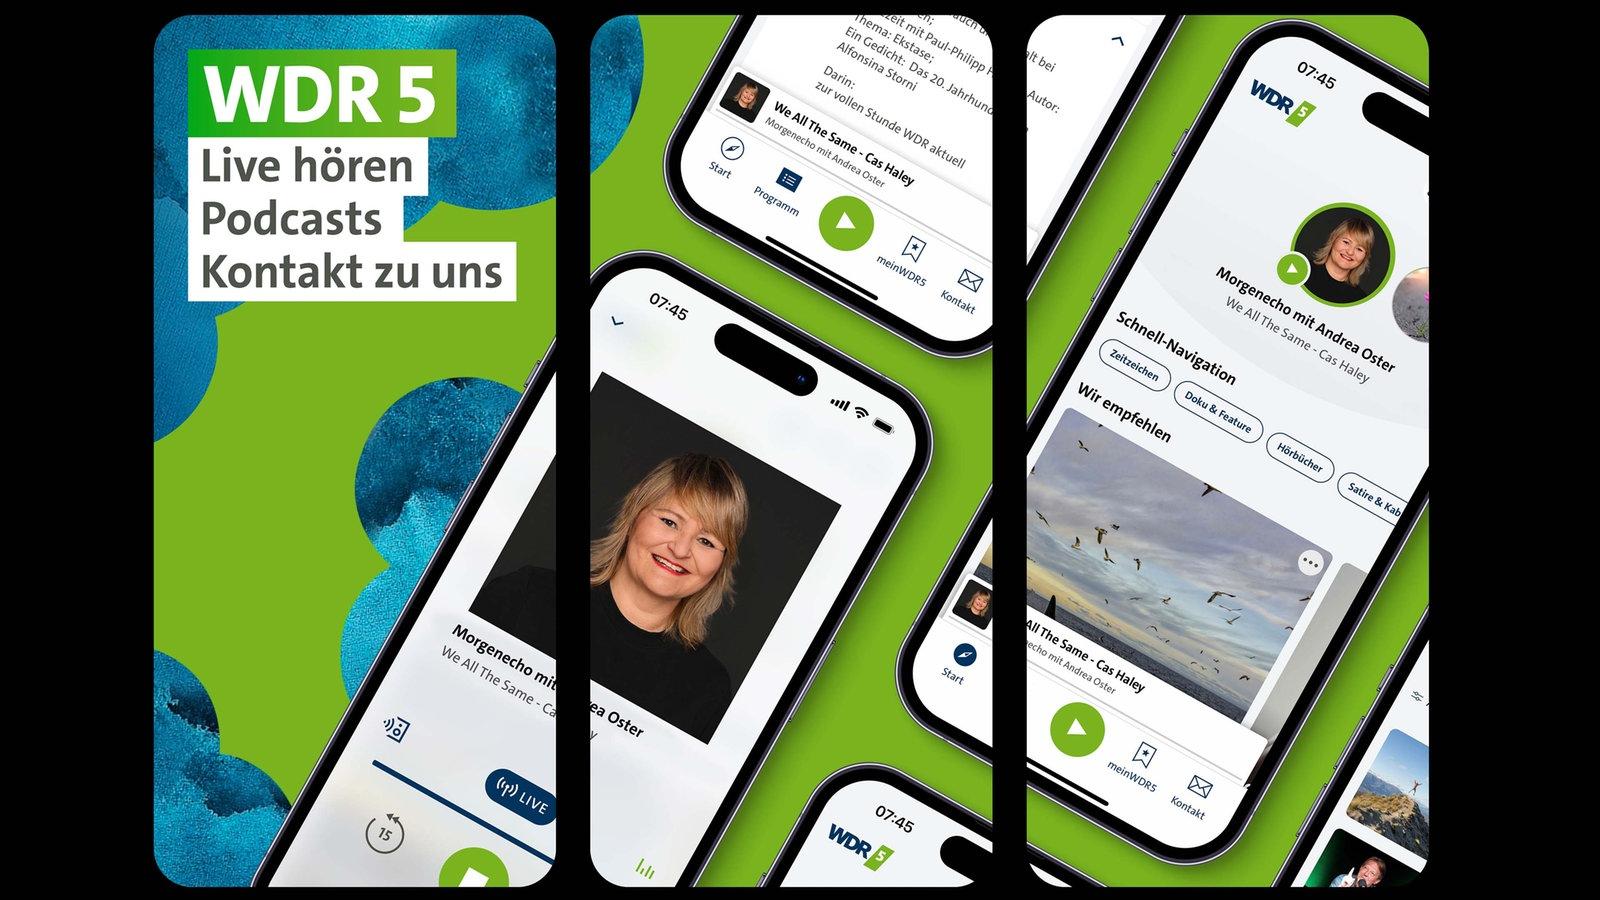 Wdr Radio App